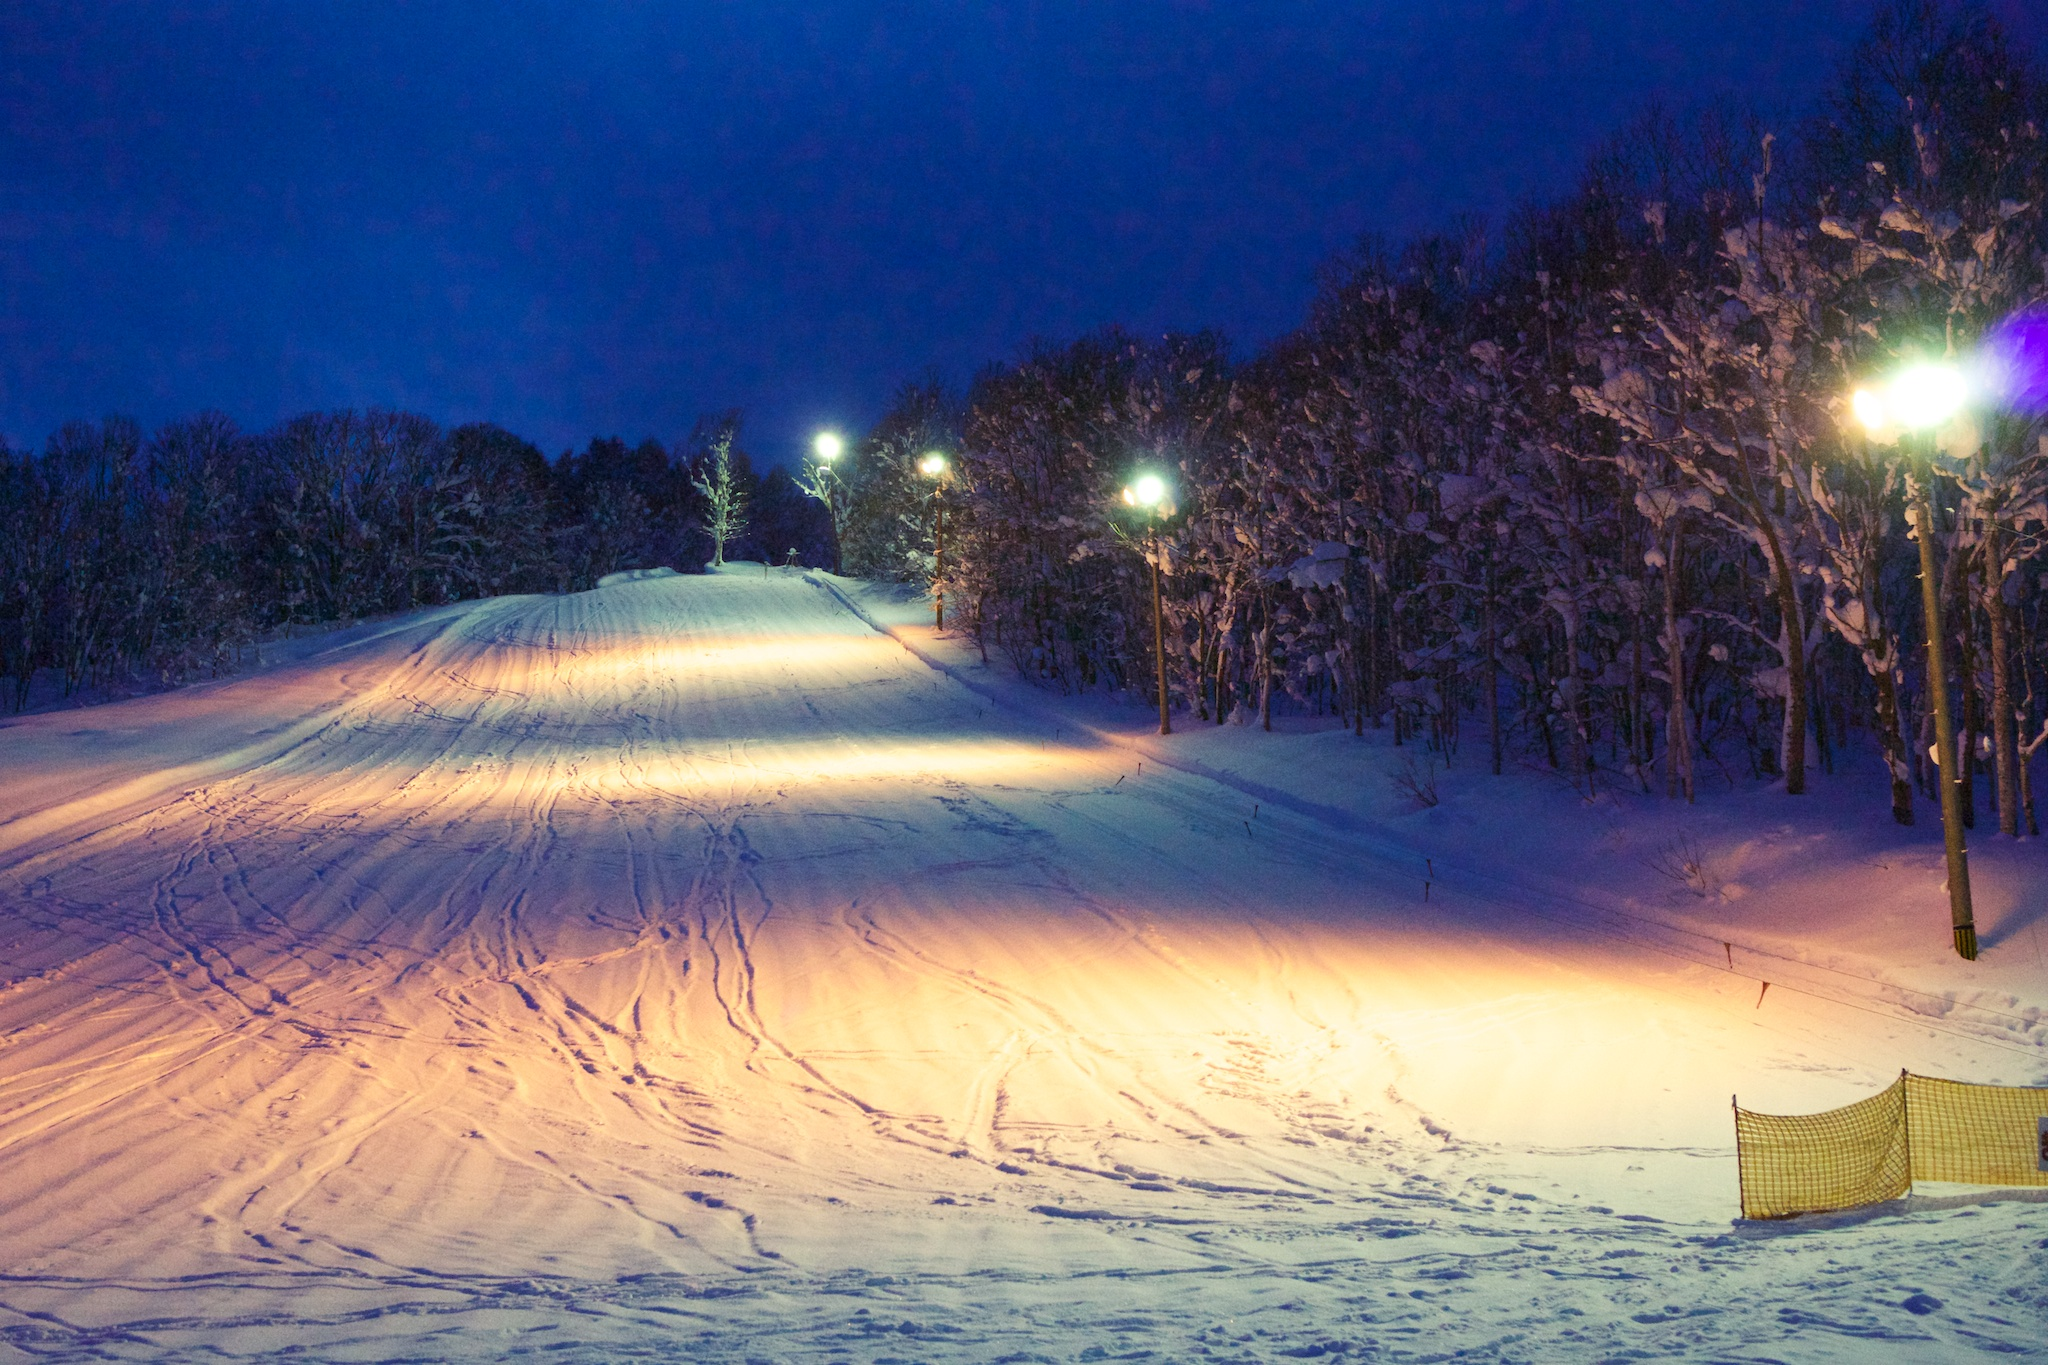 Photo: 北竜町営スキー場